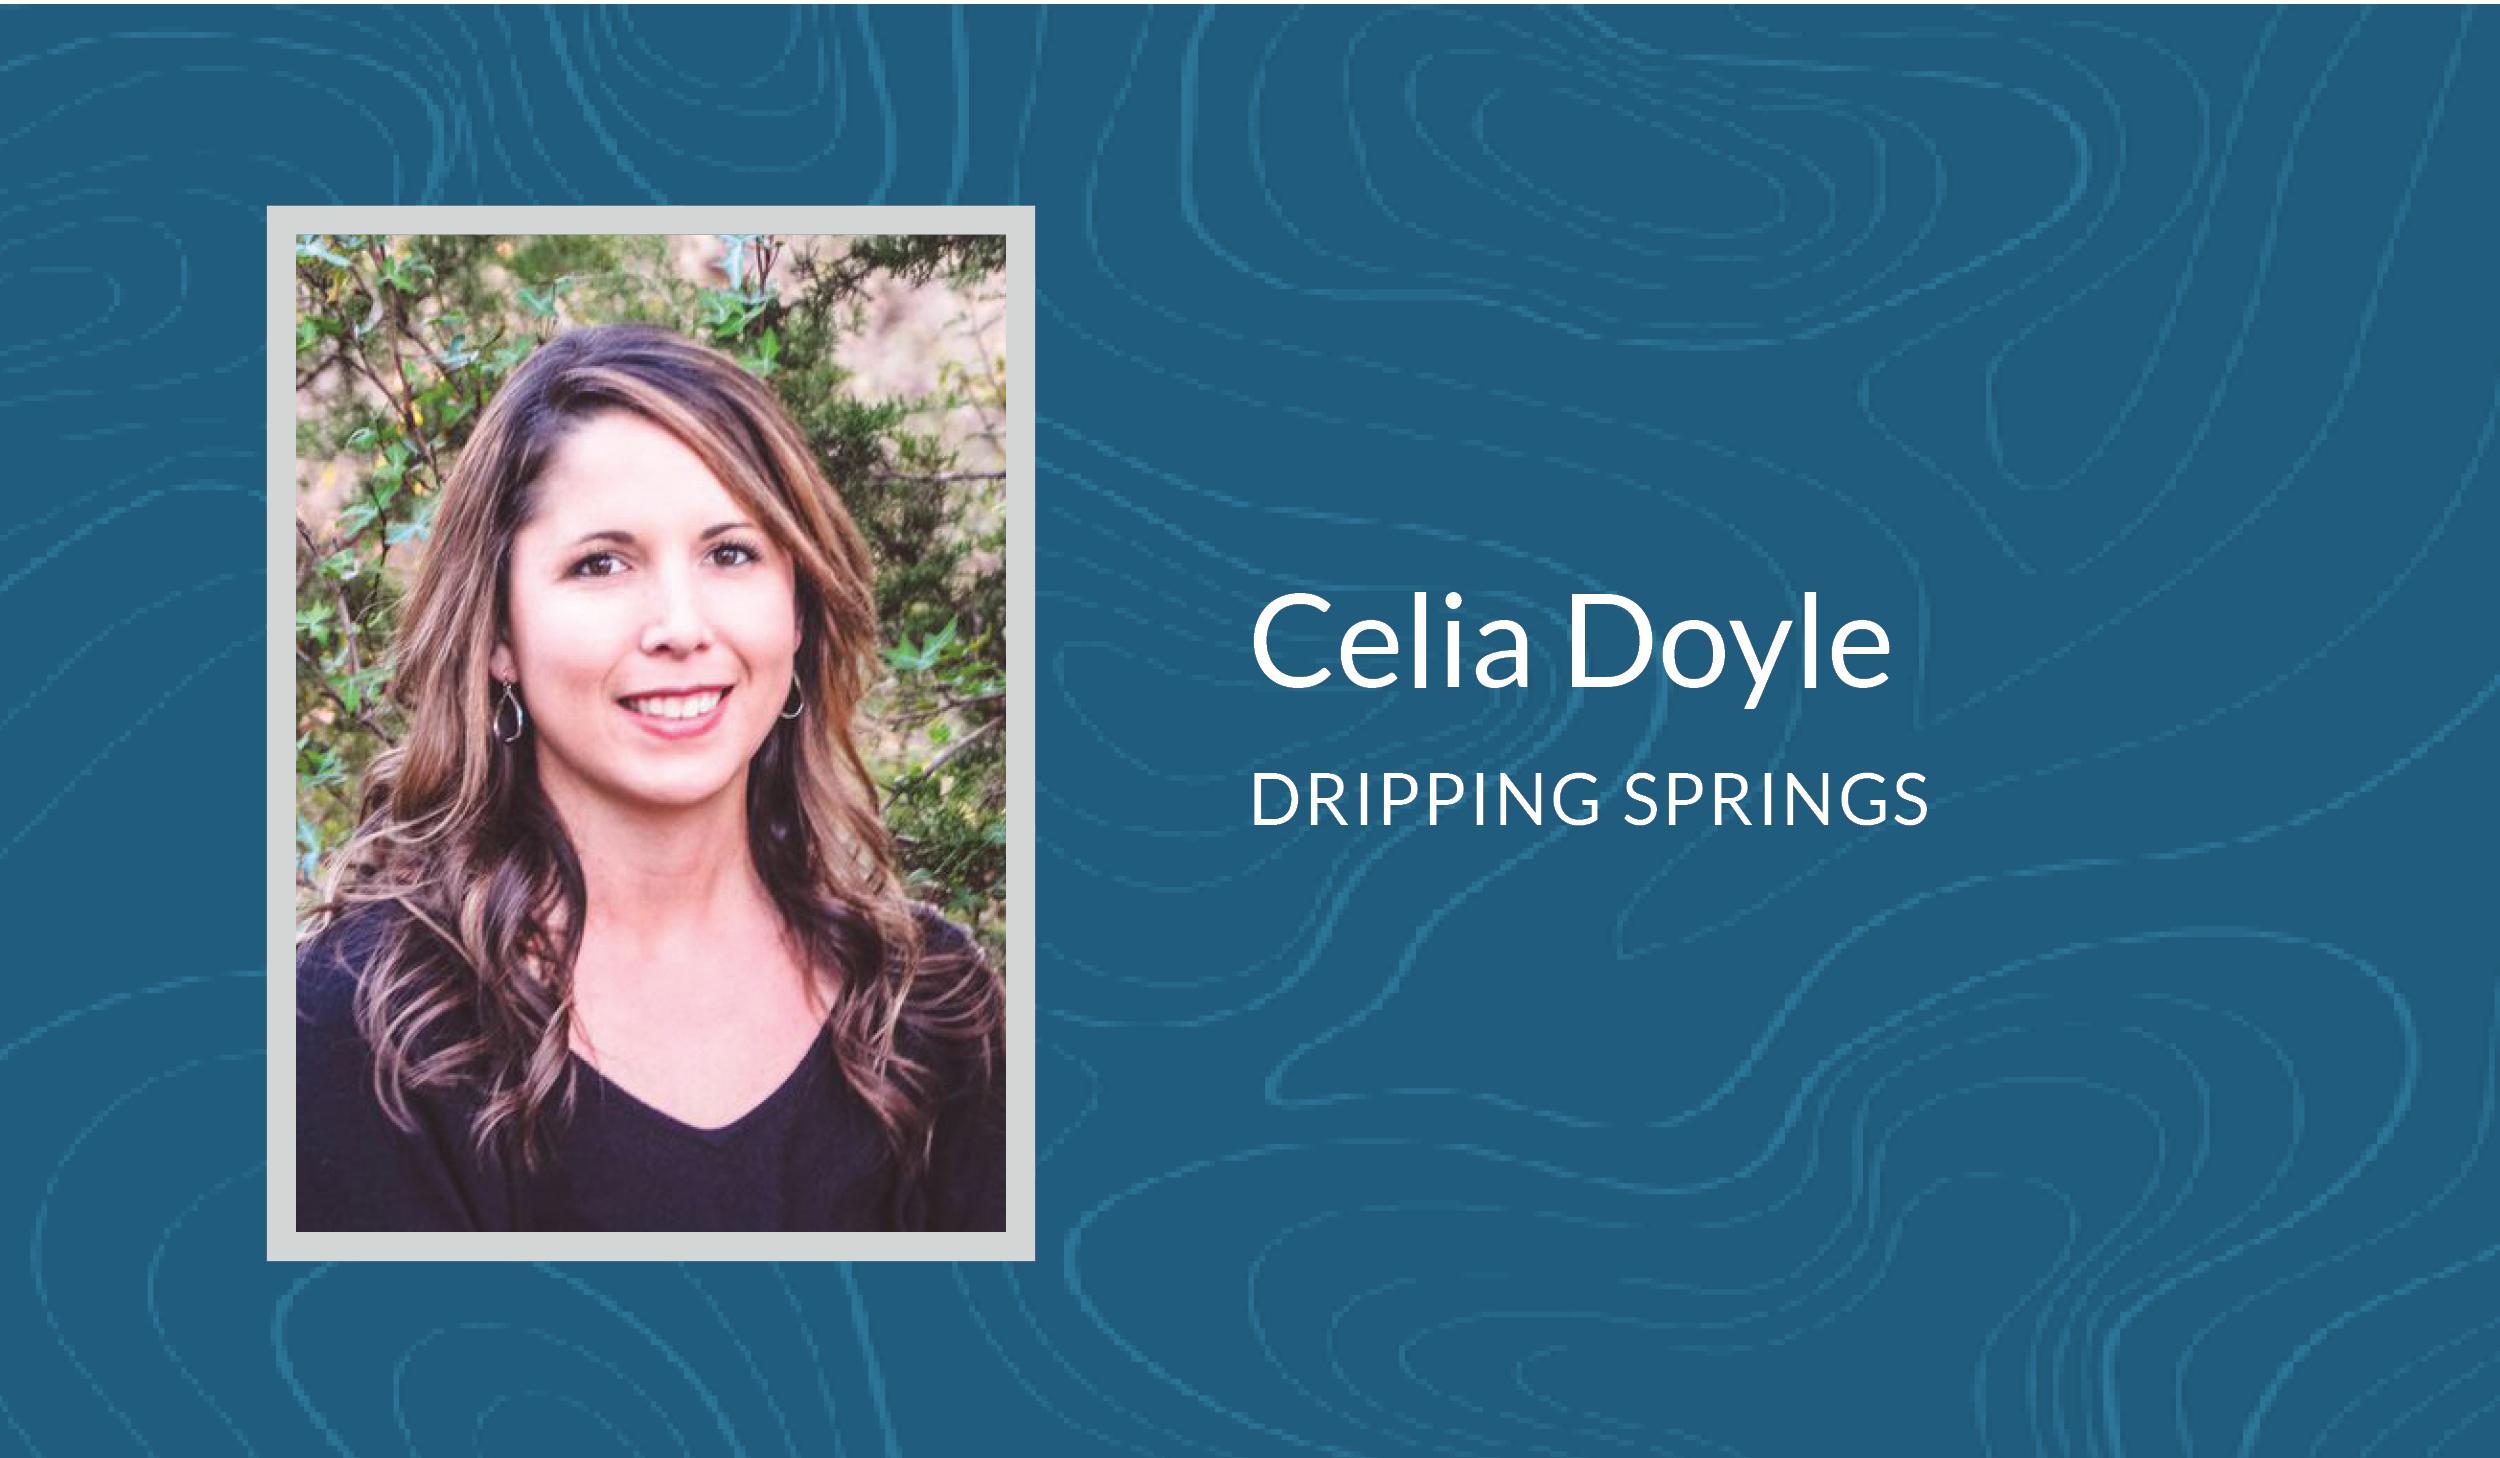 Celia Doyle Landing Page Headers.png